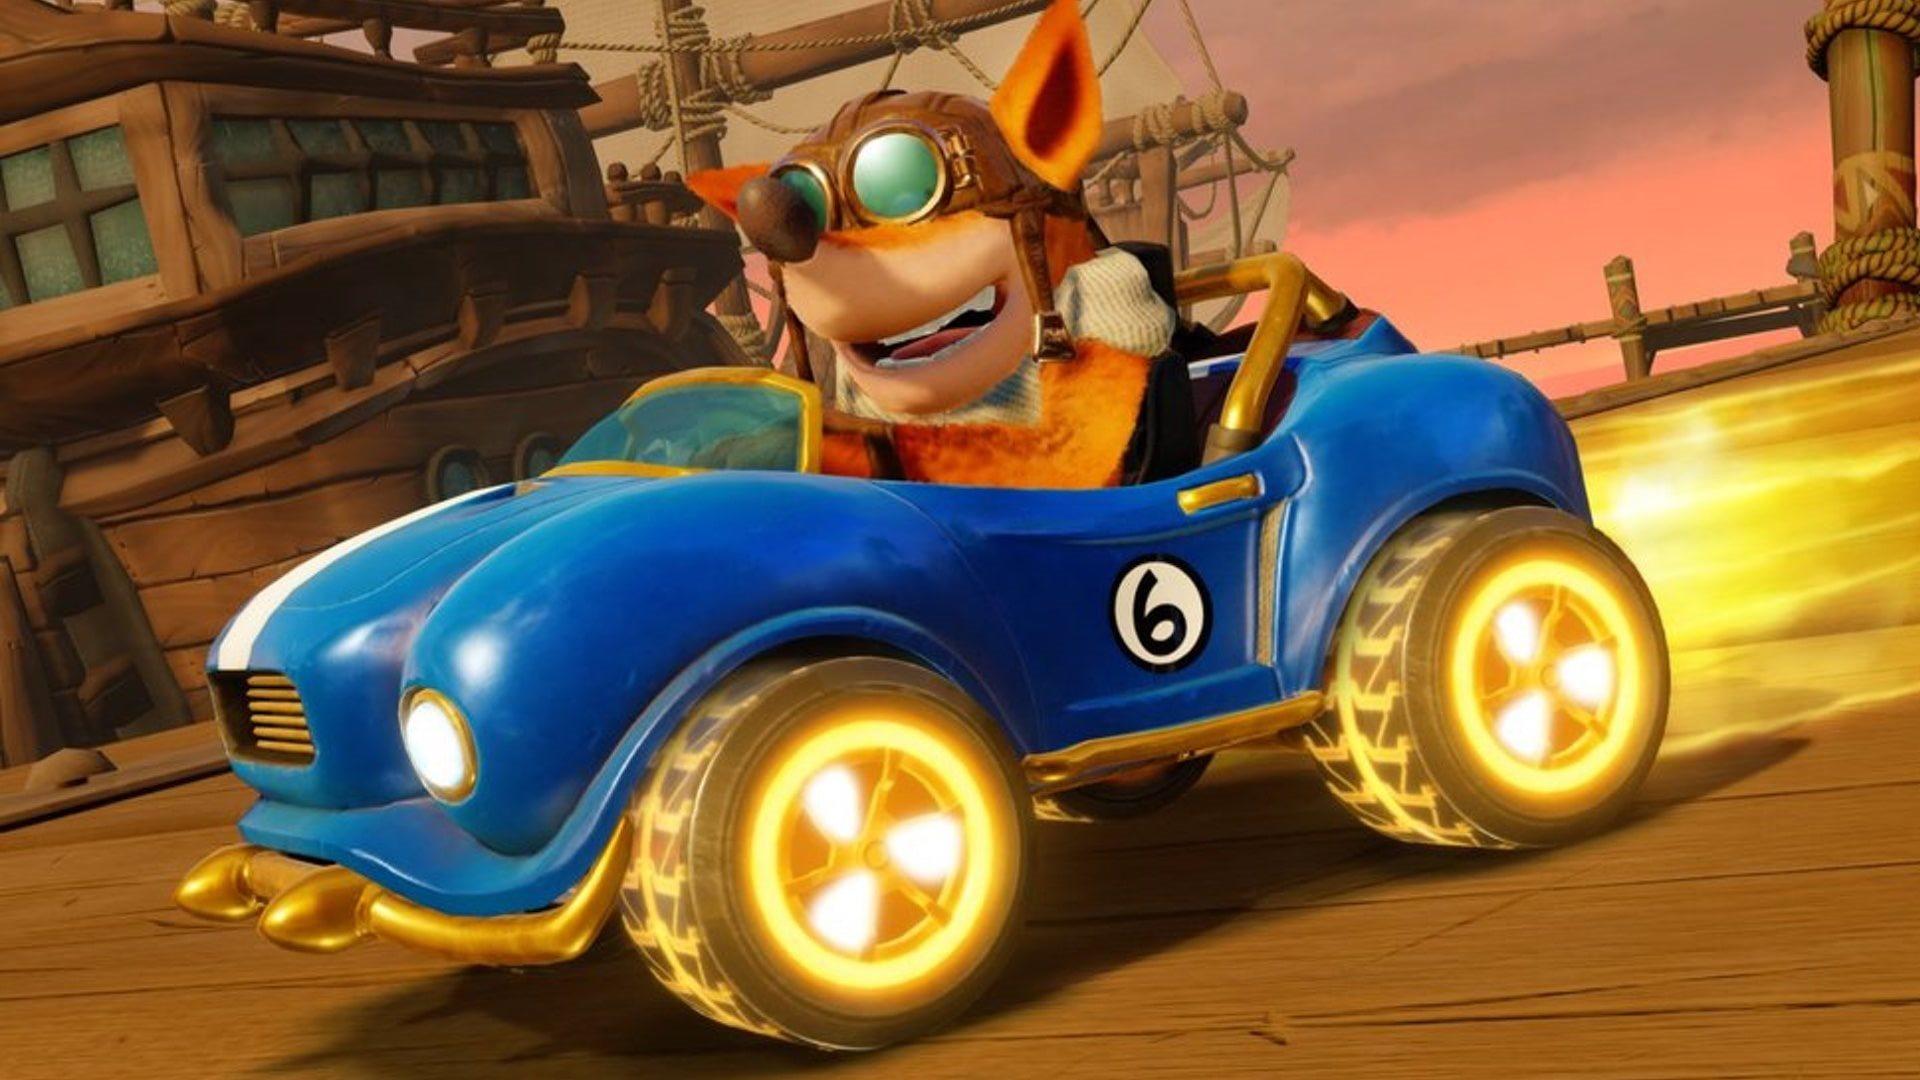 Crash Team Racing Nitro-Fueled; screenshot: crash